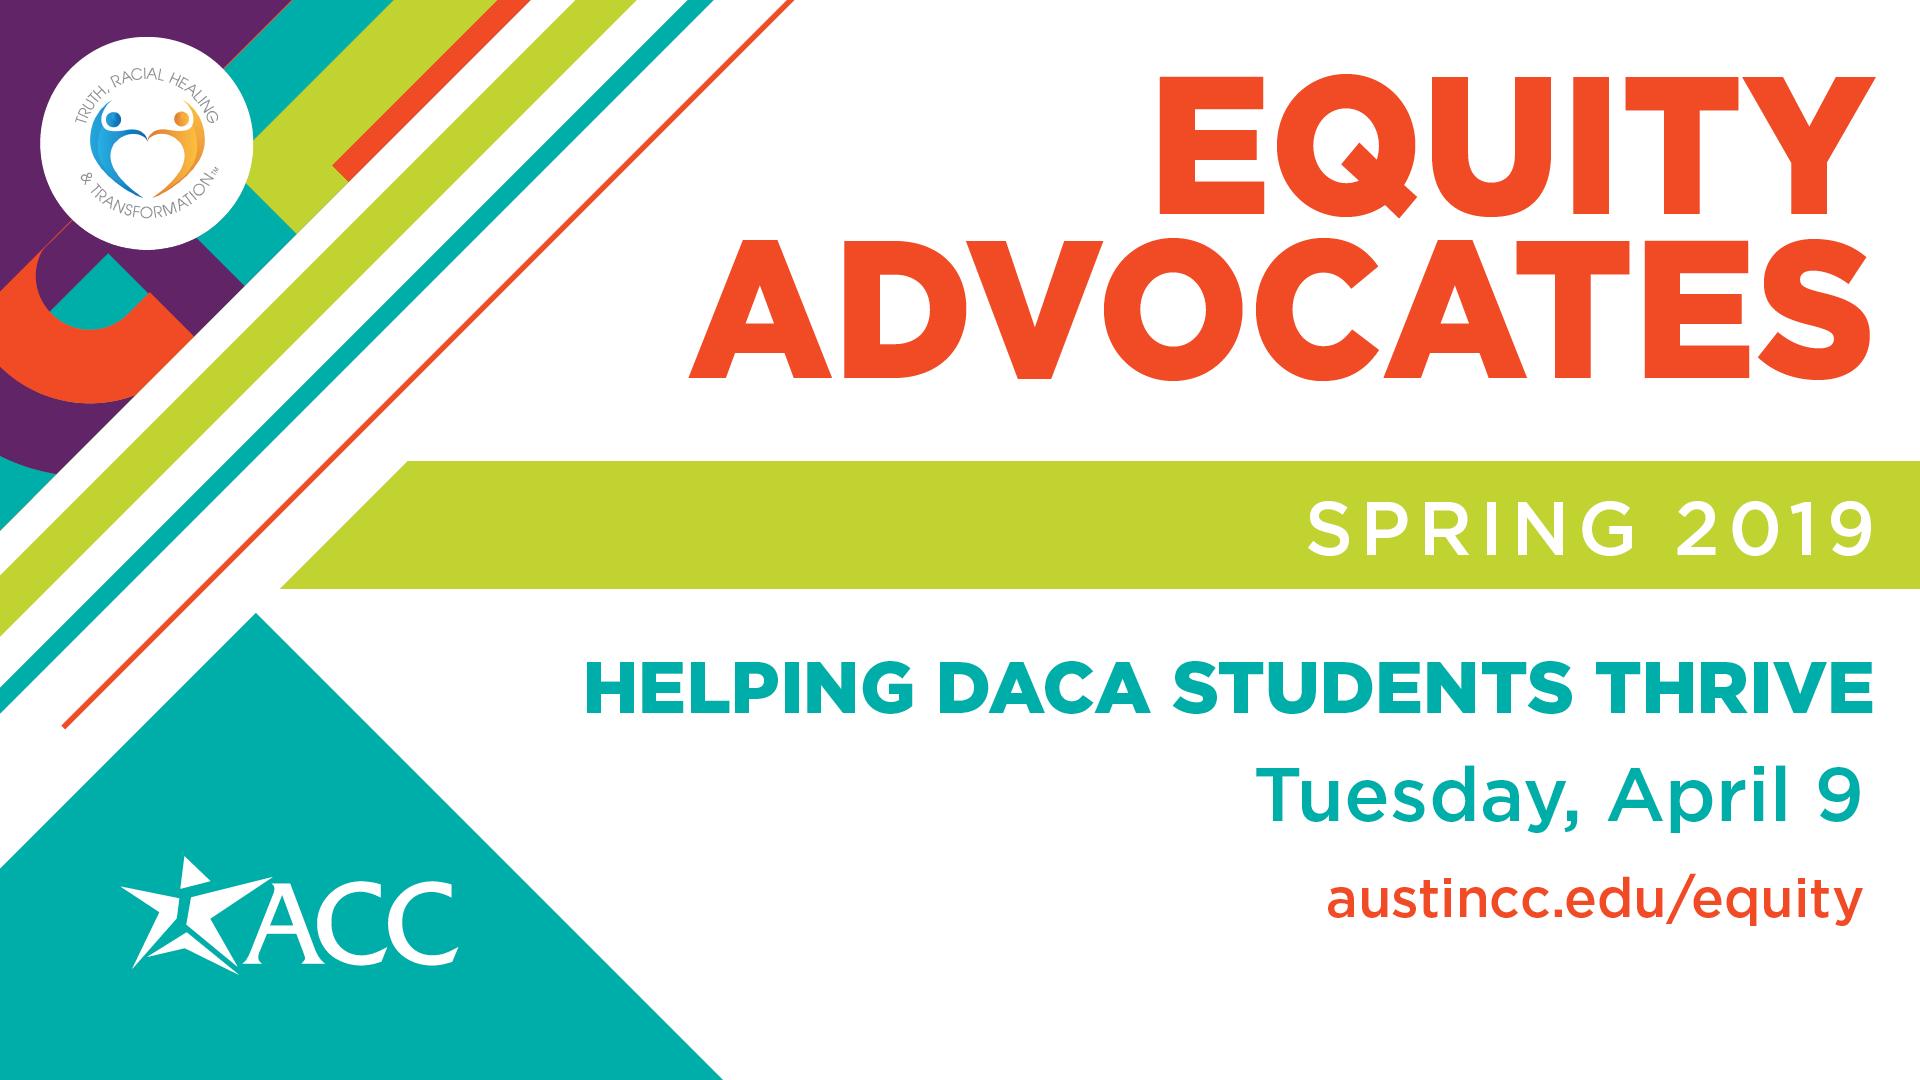 Equity Advocates April 9 2019